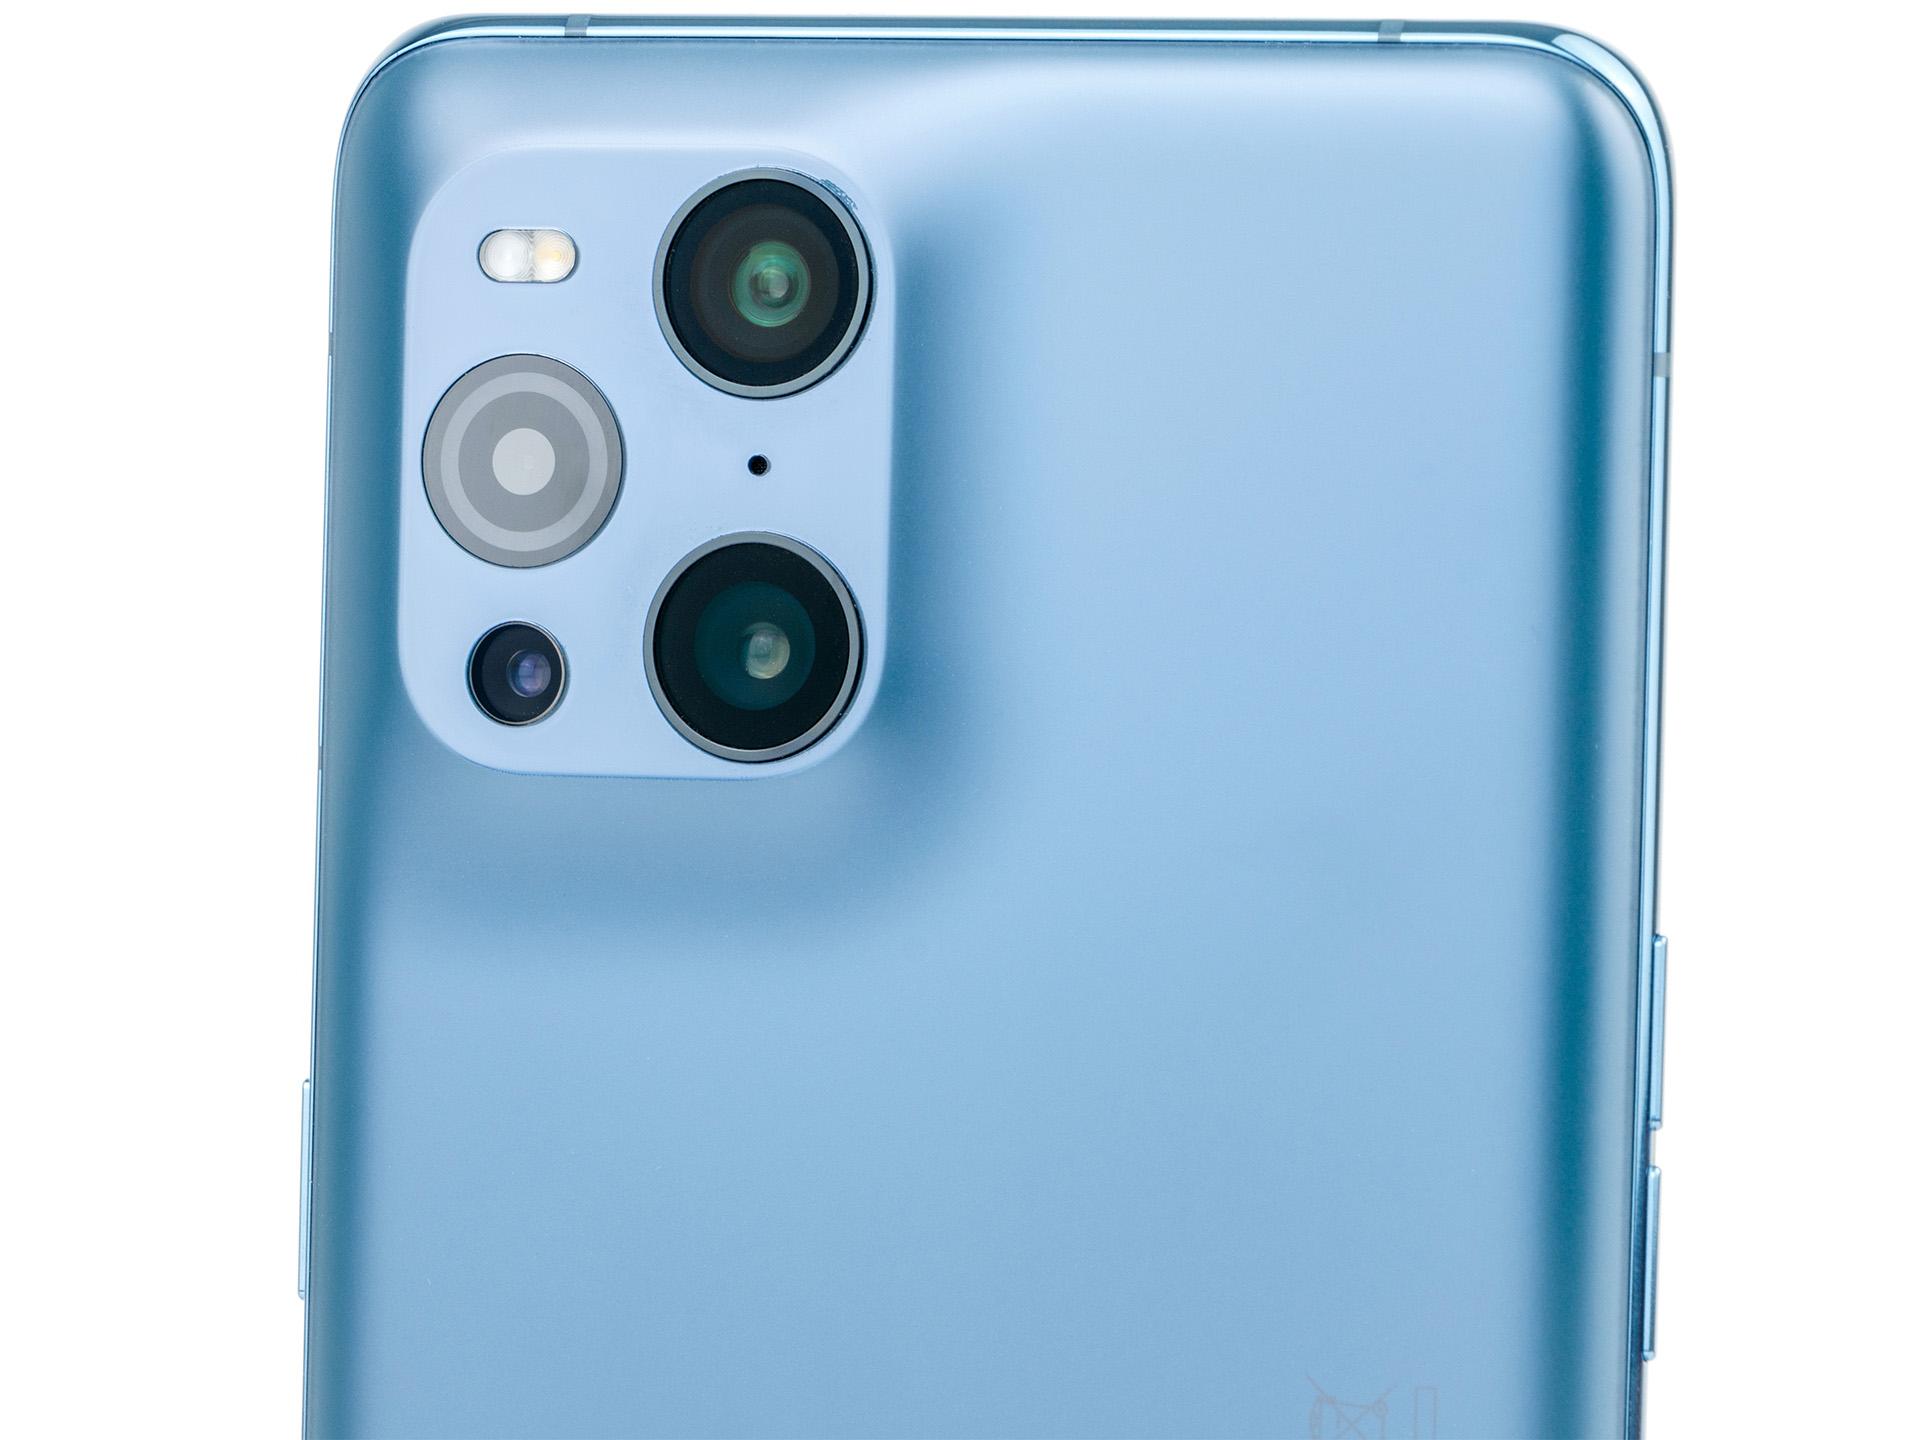 Oppo Find X3 Pro: Starkes Smartphone in der Premiumklasse -  Notebookcheck.com News